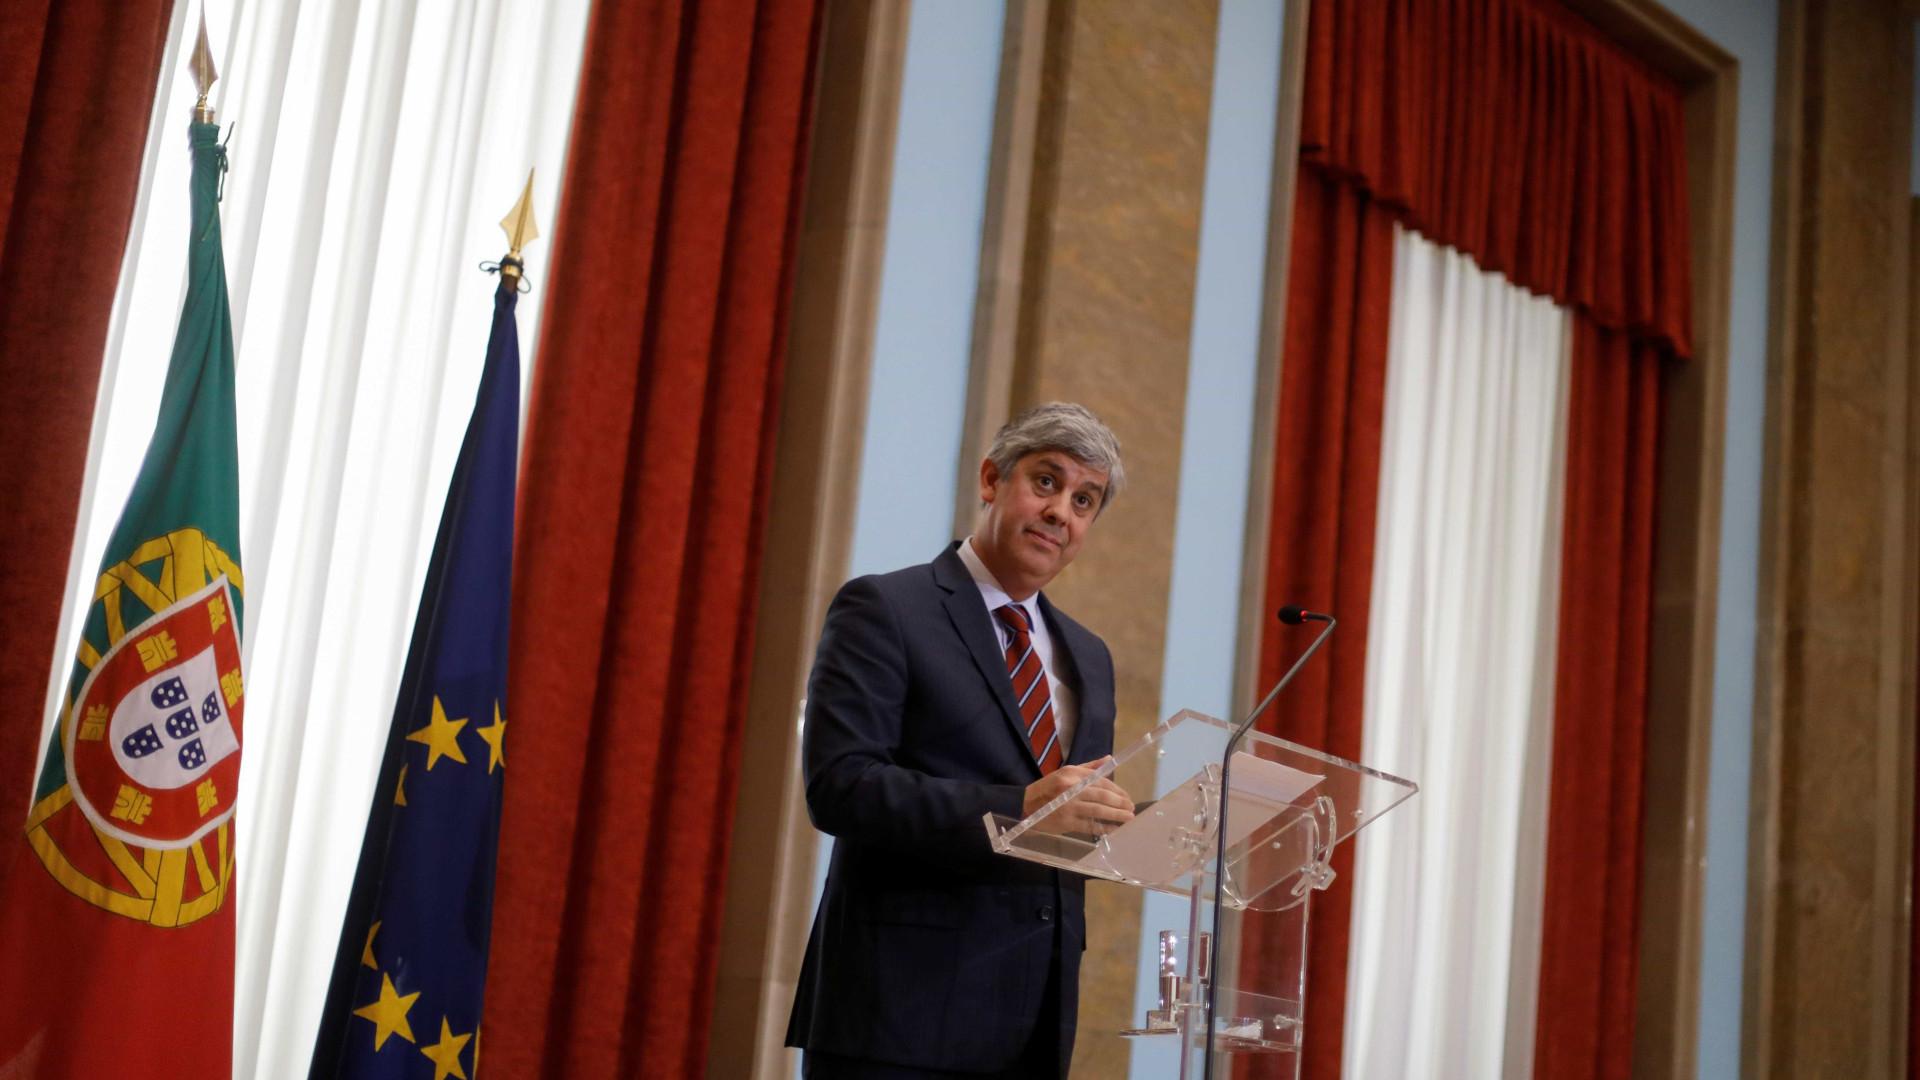 Mário Centeno é candidato ao Eurogrupo e provavelmente o futuro presidente